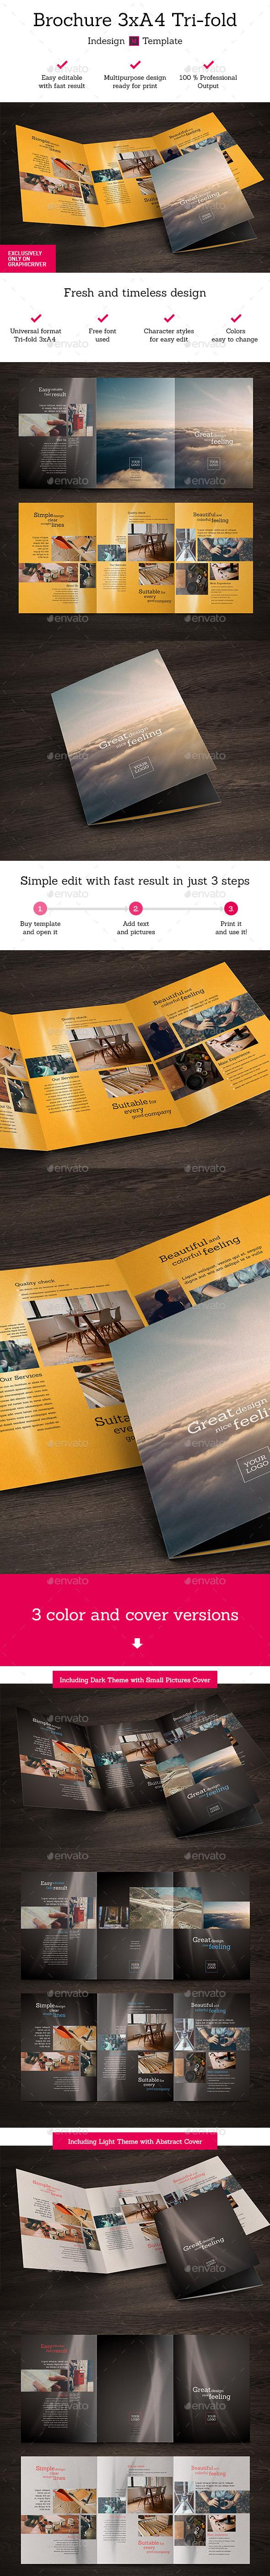 Brochure 3xA4 Tri-fold Indesign Template Set - Brochures Print Templates